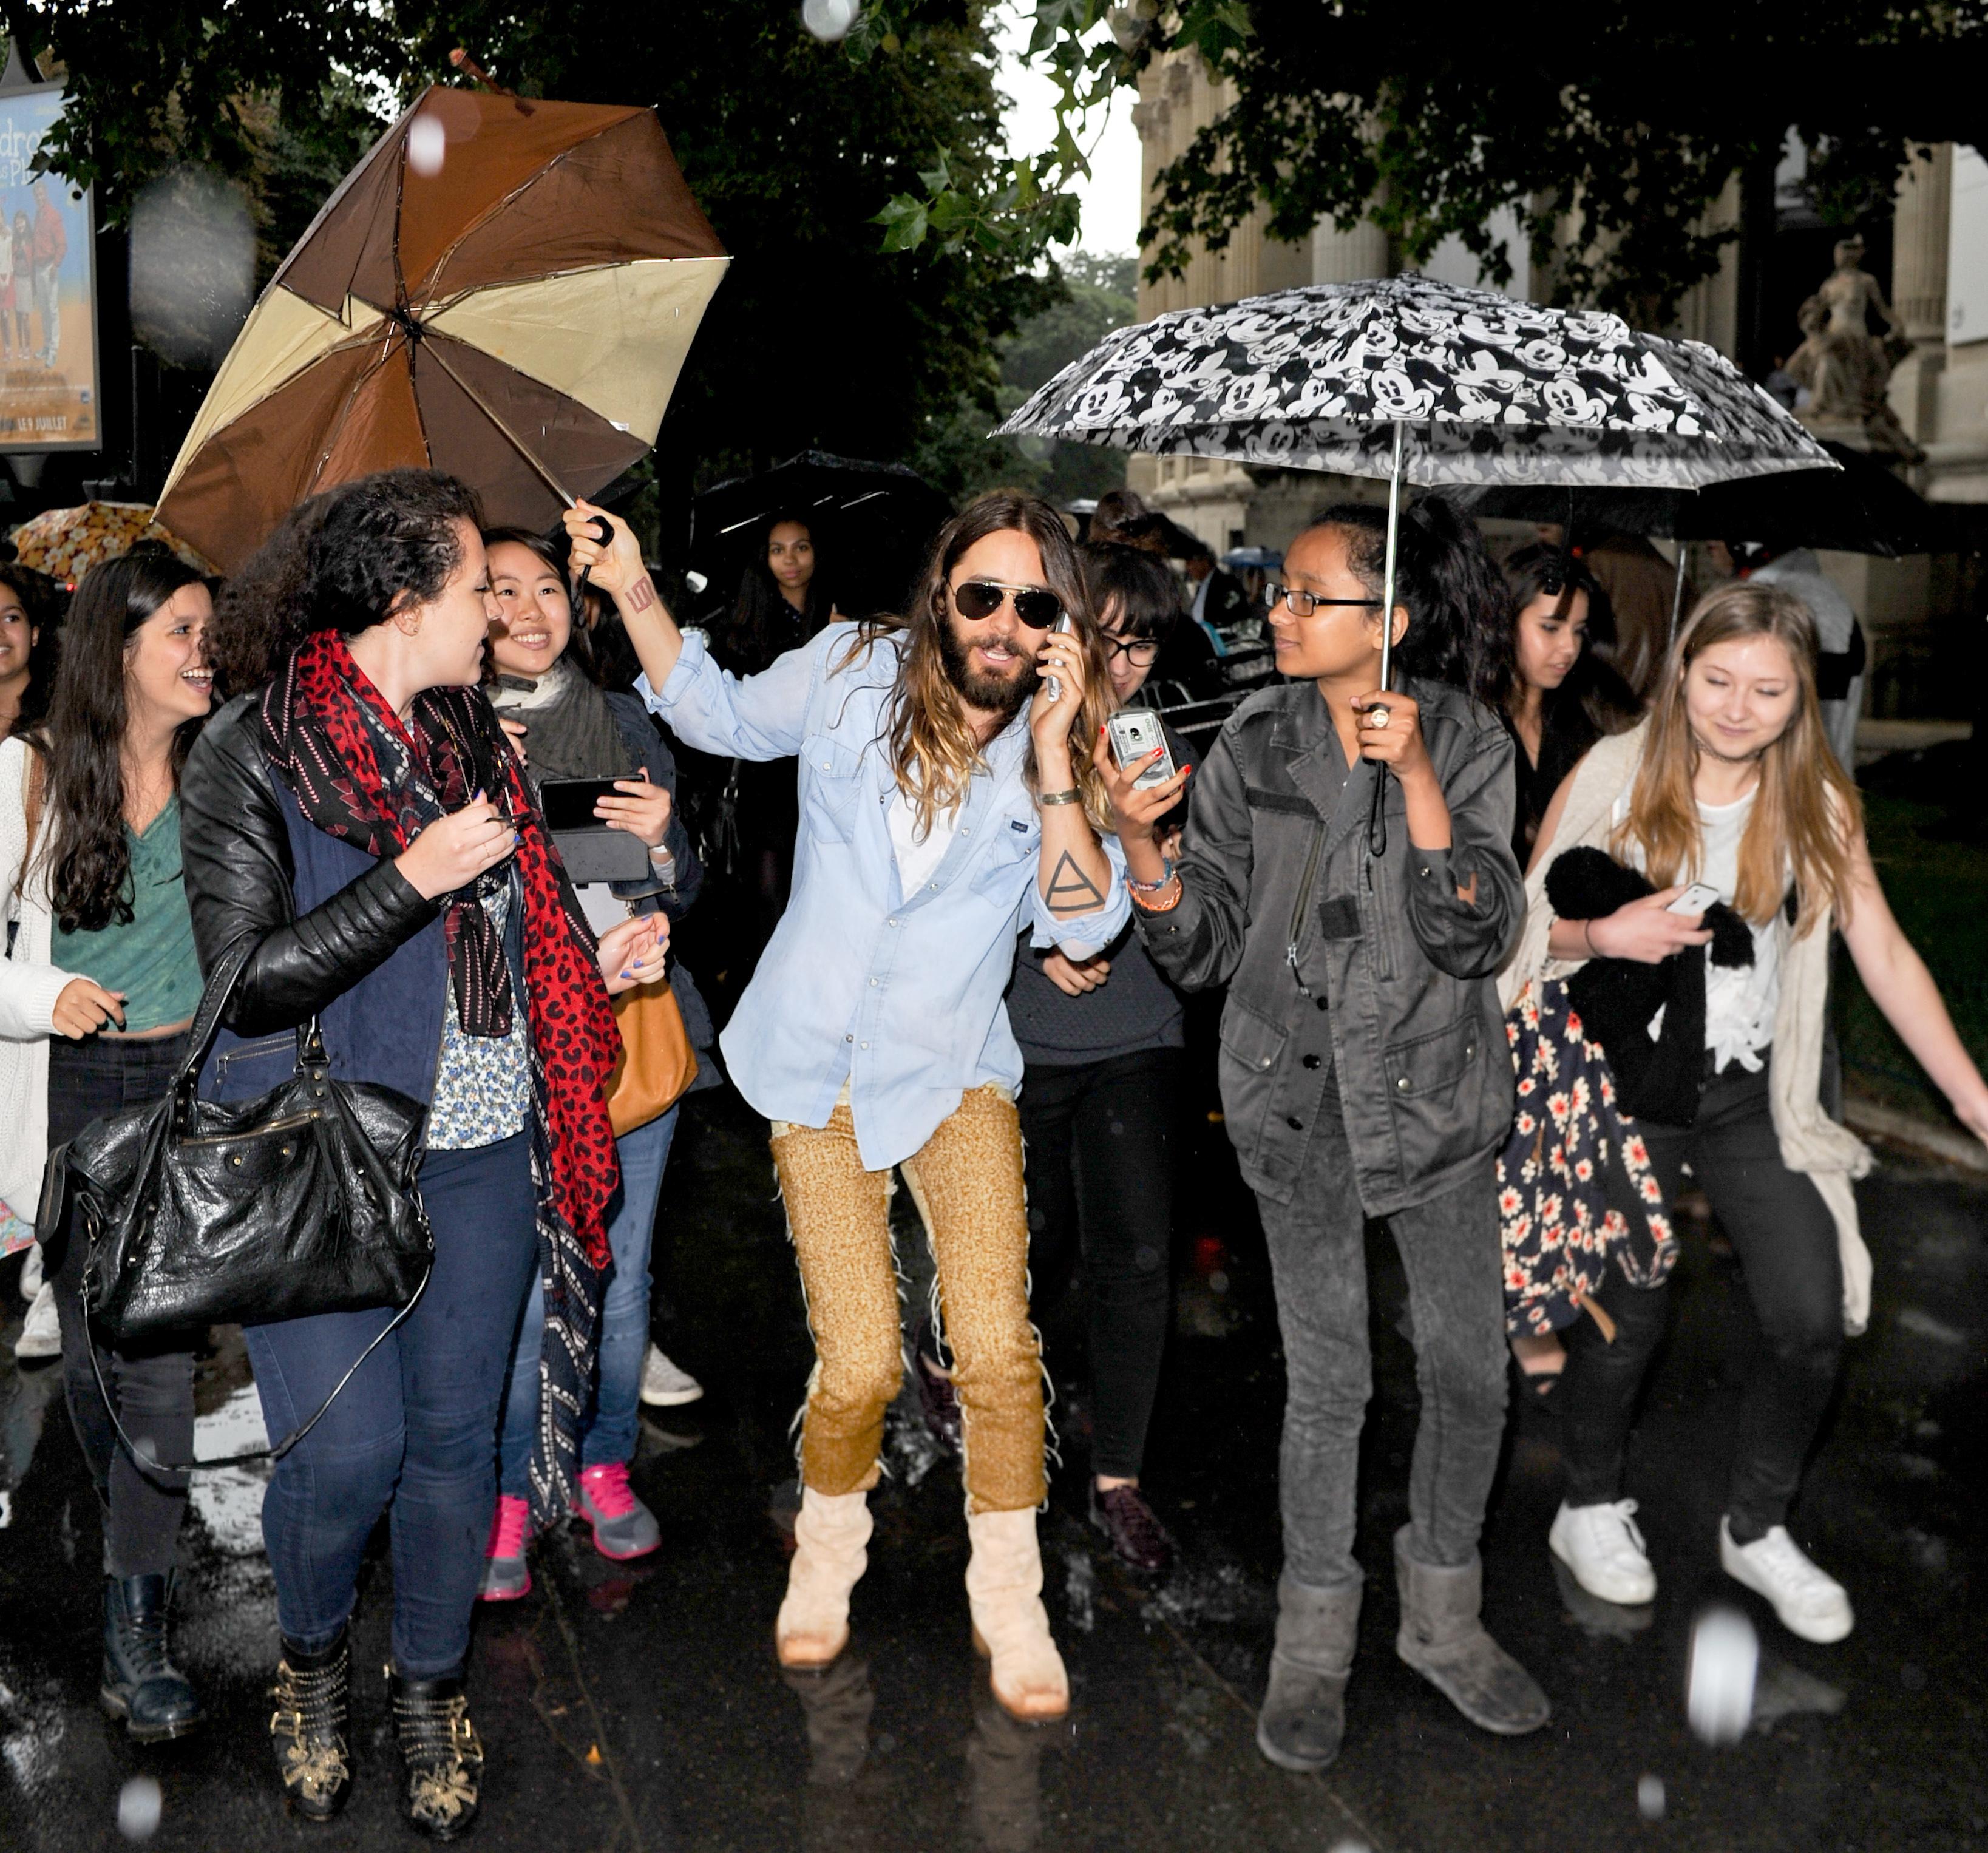 jared leto umbrella